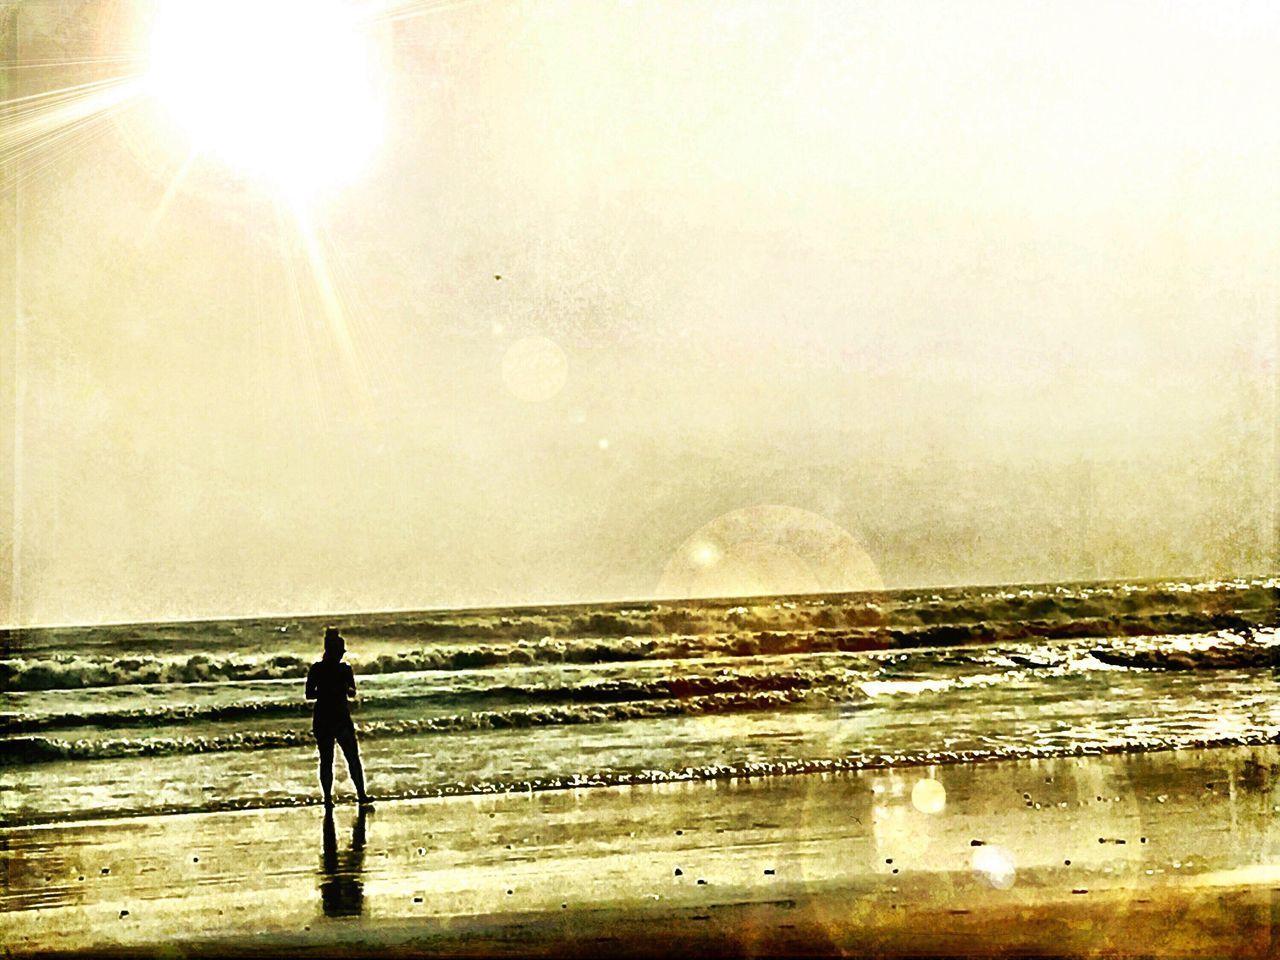 Costa Rica Pacific Ocean Sunset Beauty In Nature Nature Real People Standing Water Silhouette Sky Beach Wave Sand Beach Photography Travel Photography Waves, Ocean, Nature Happy Me Myself And I Enjoying Life Pura Vida ✌ Nosara